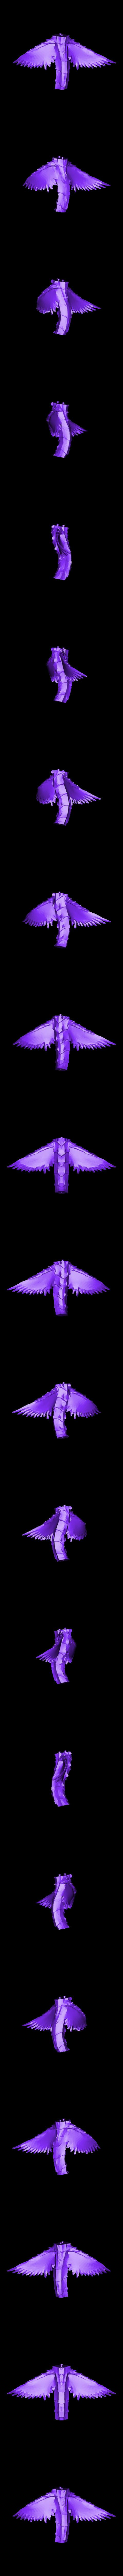 Kukulkan_Wings_2.stl Download free STL file SMITE Kukulkan Statue • 3D printable object, Solid_Alexei